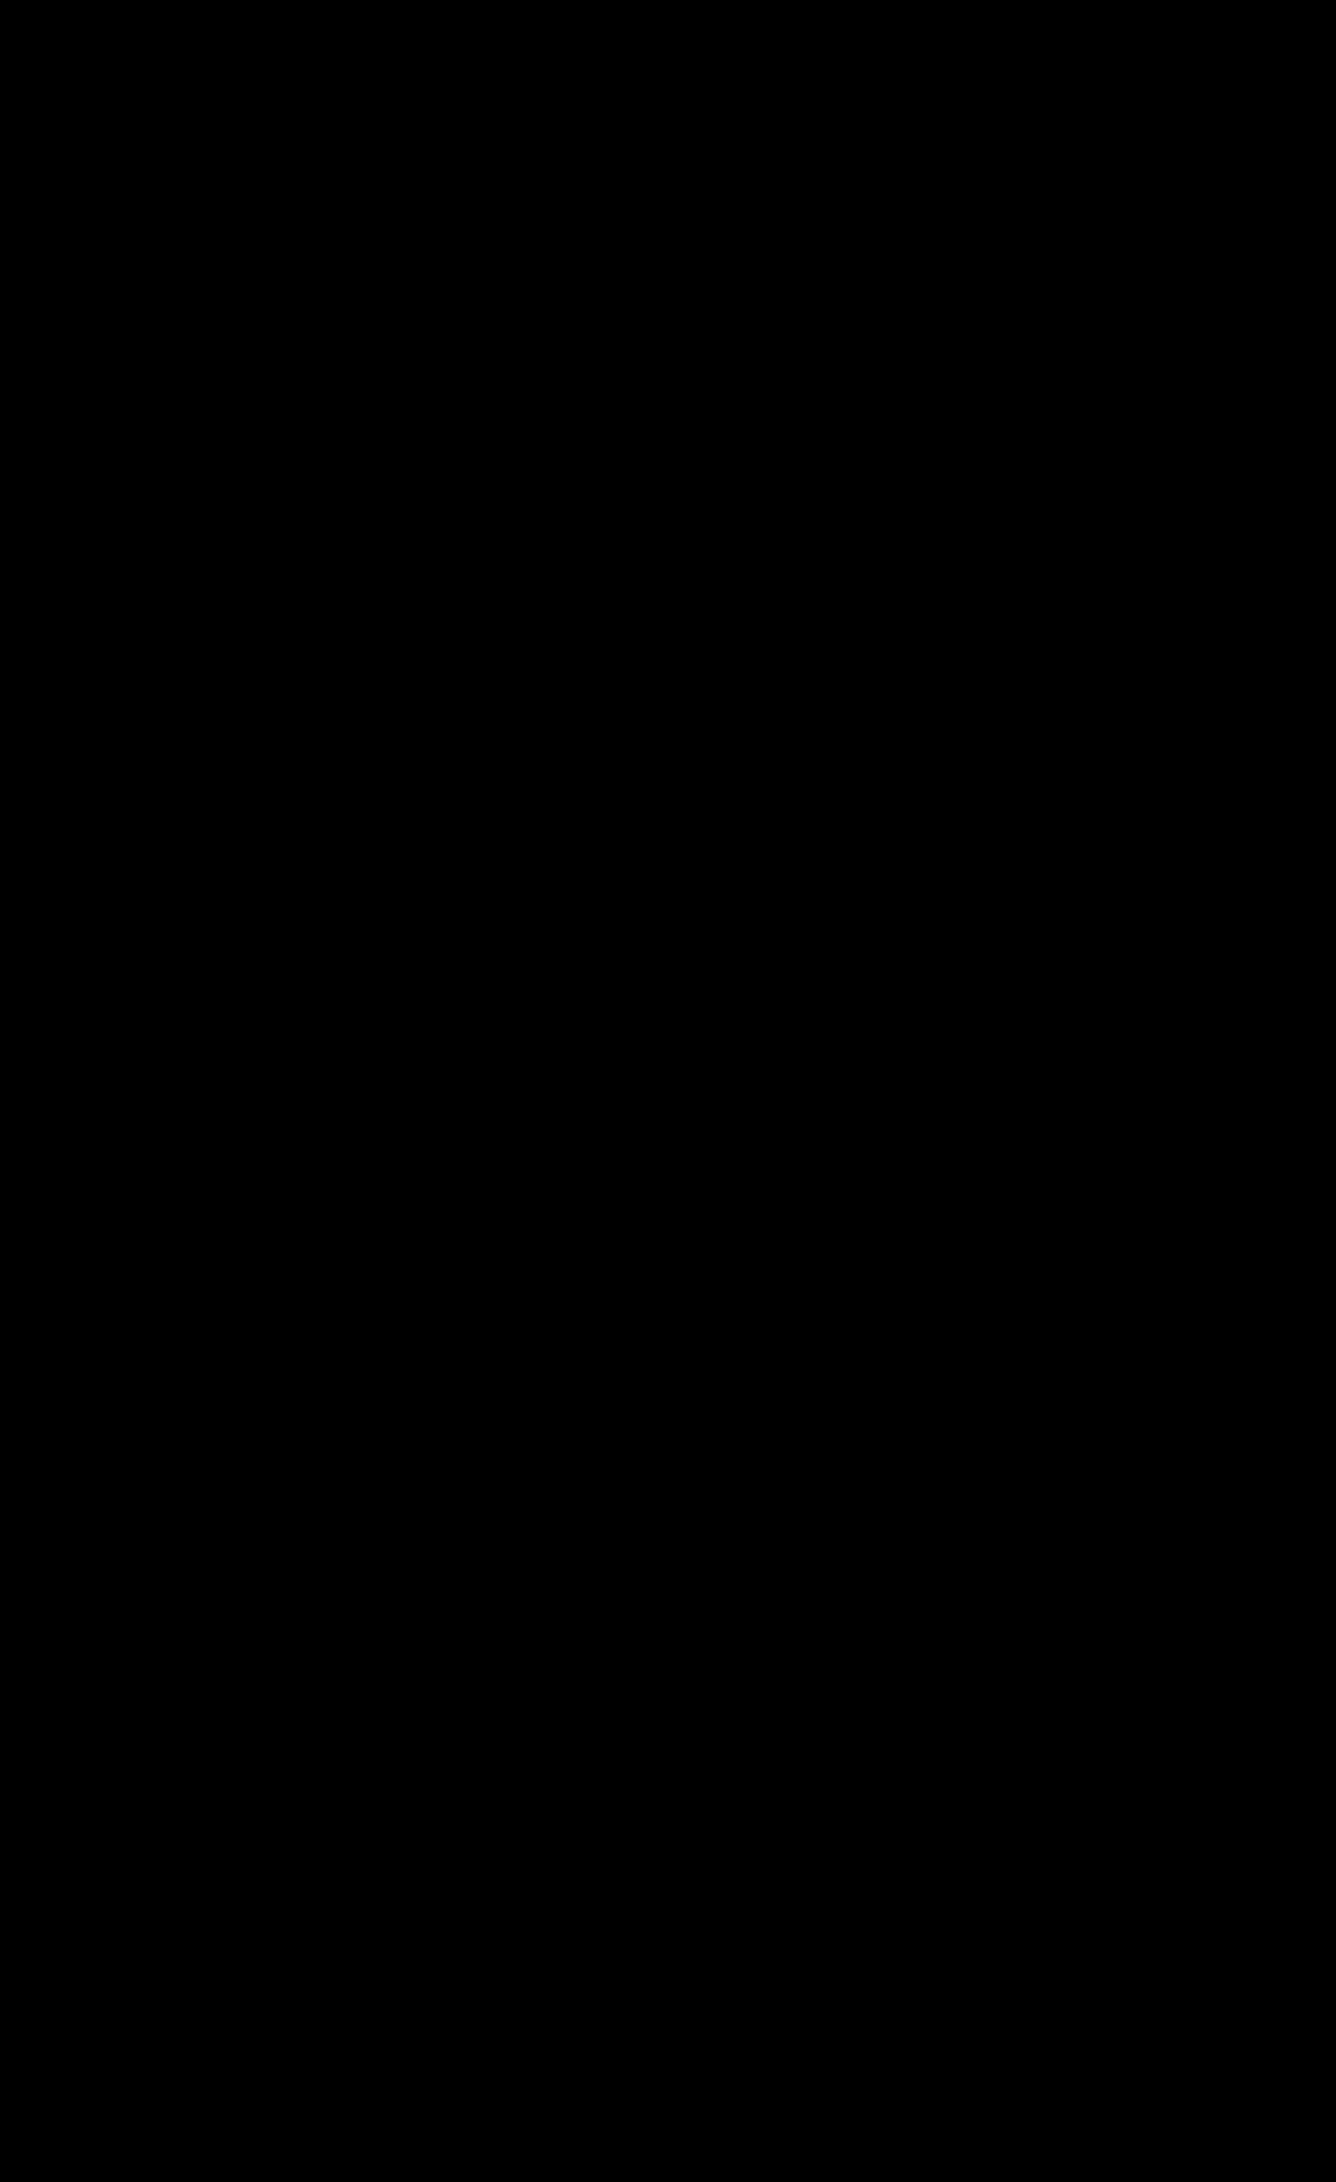 Clip art illustration black. Dress clipart silhouette